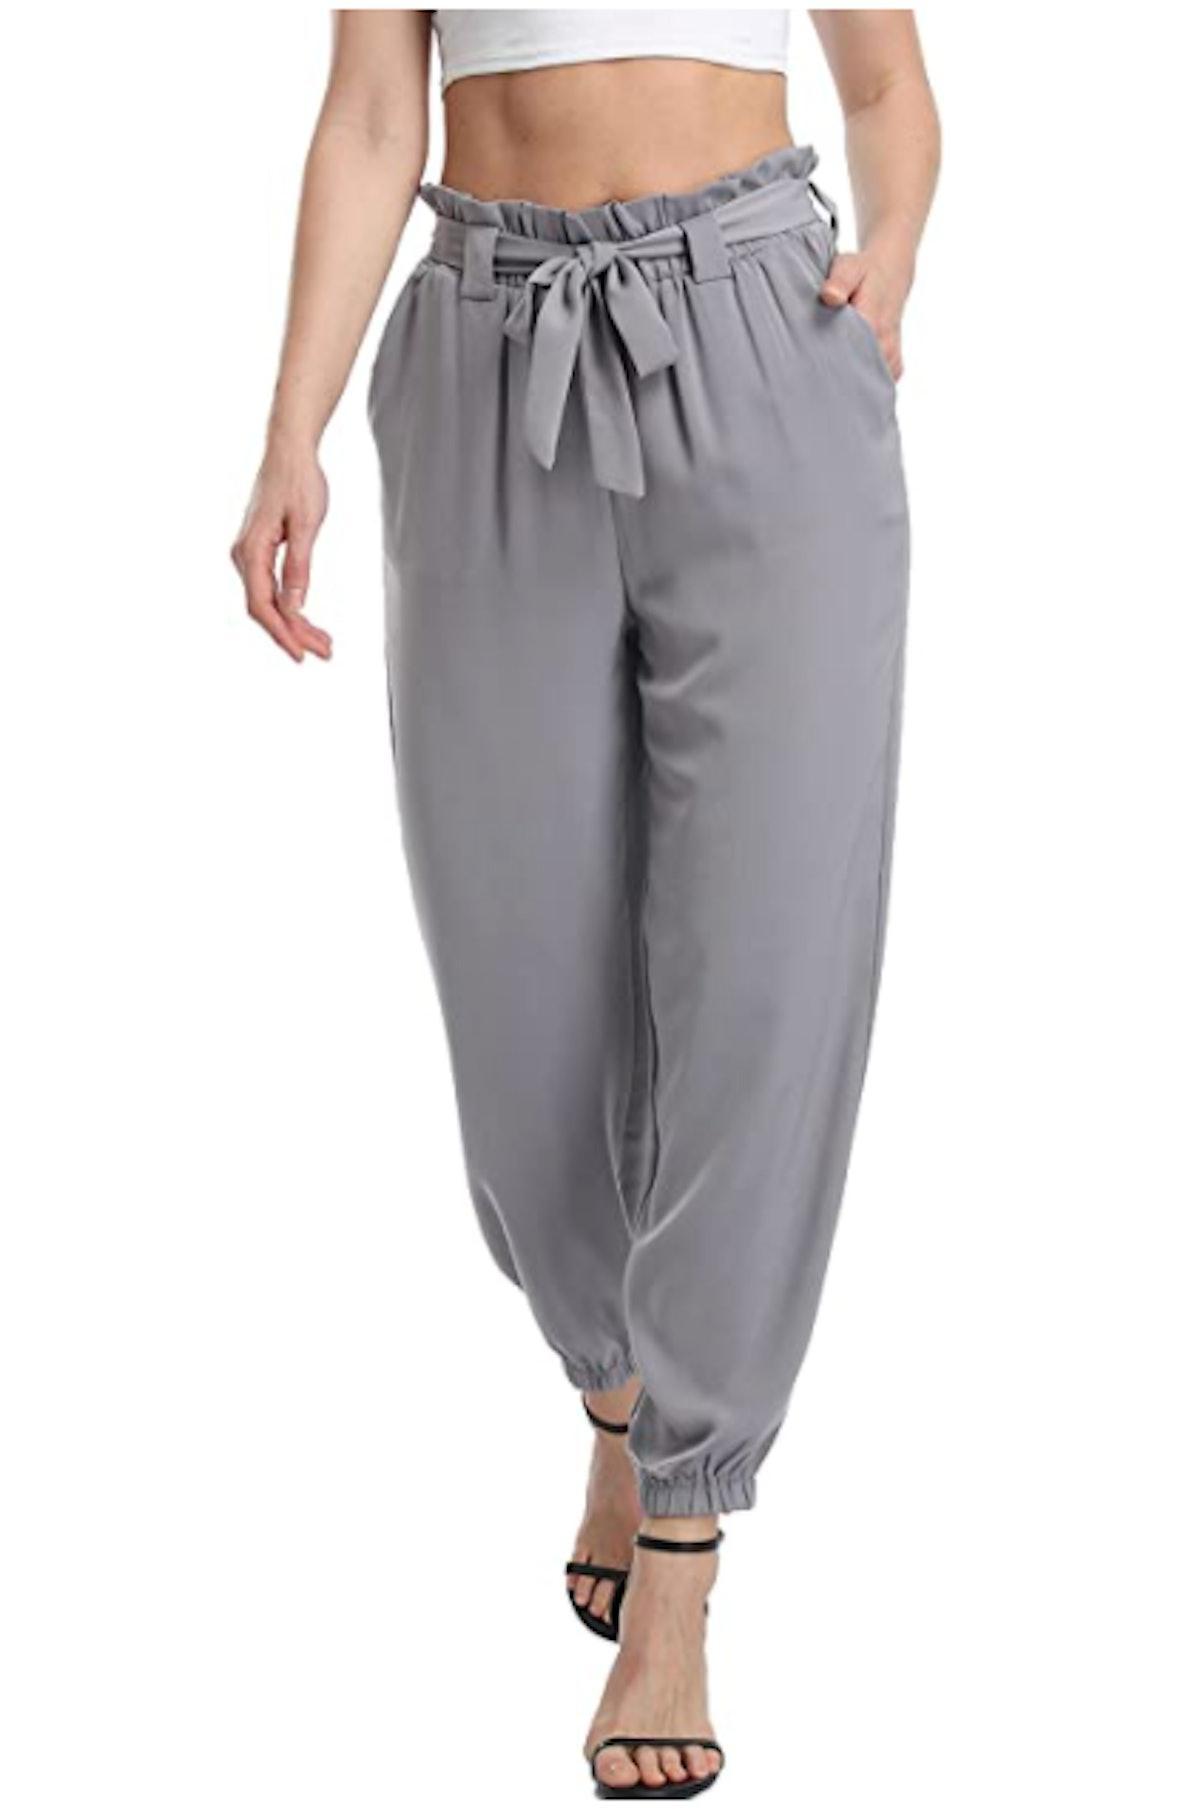 Dilgul High Waist Relaxed Fit Pants